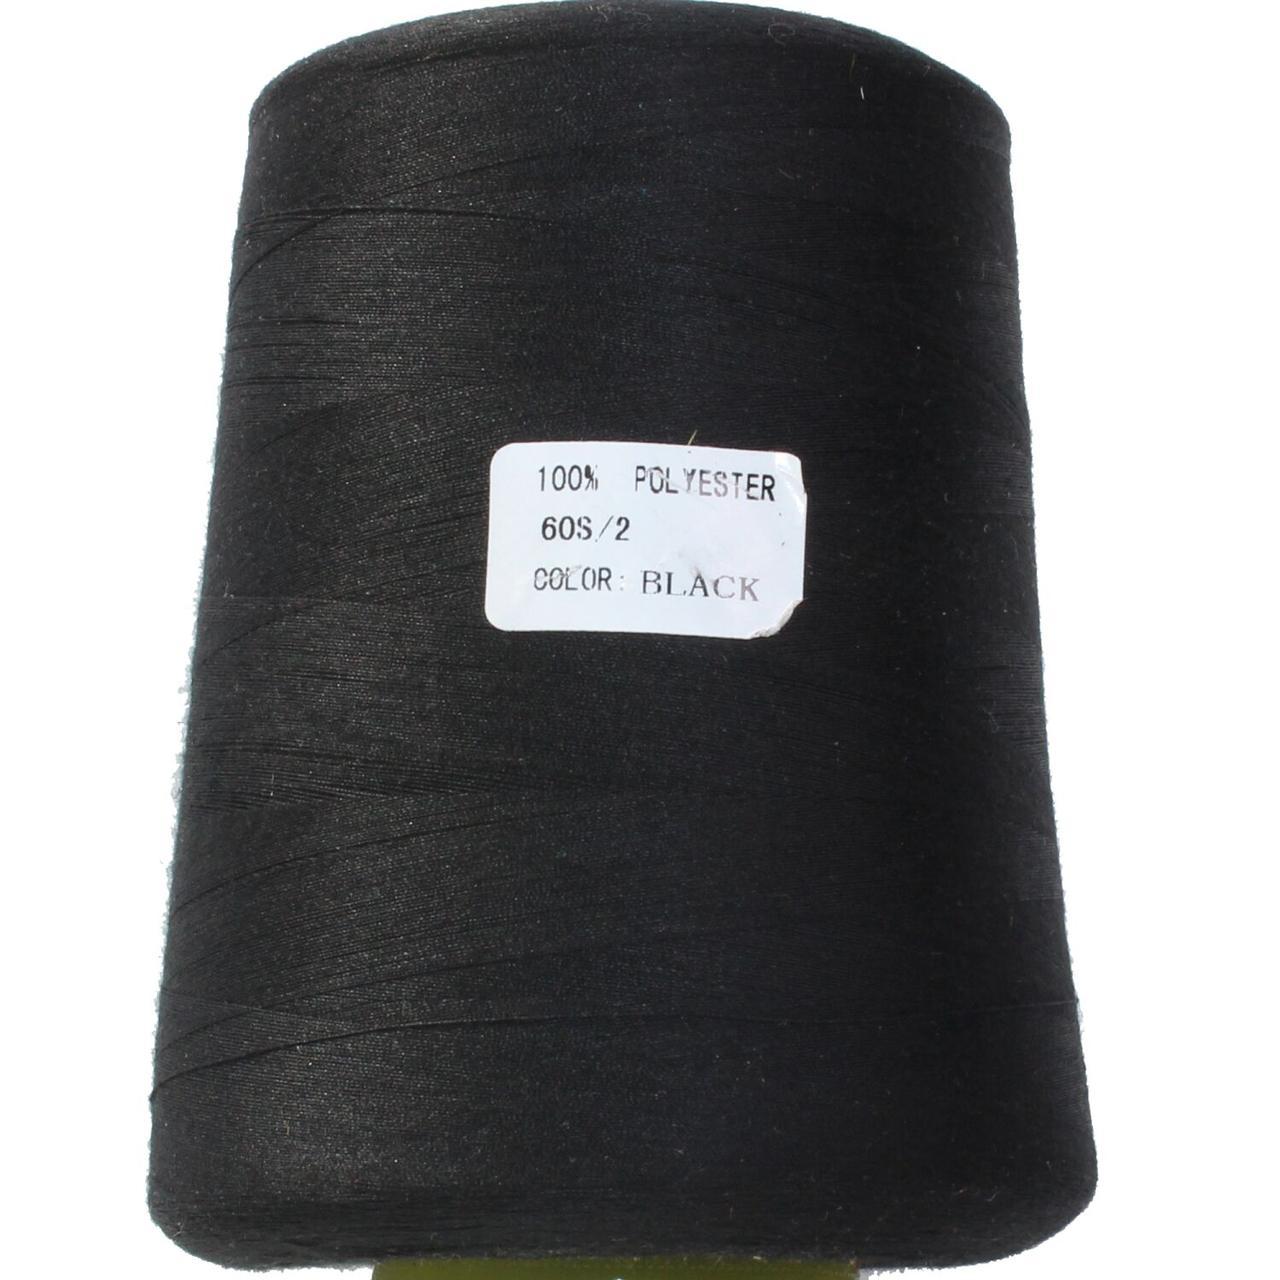 Нитка поліестер 60S/2, нижня, колір black, Козачок-ТМ